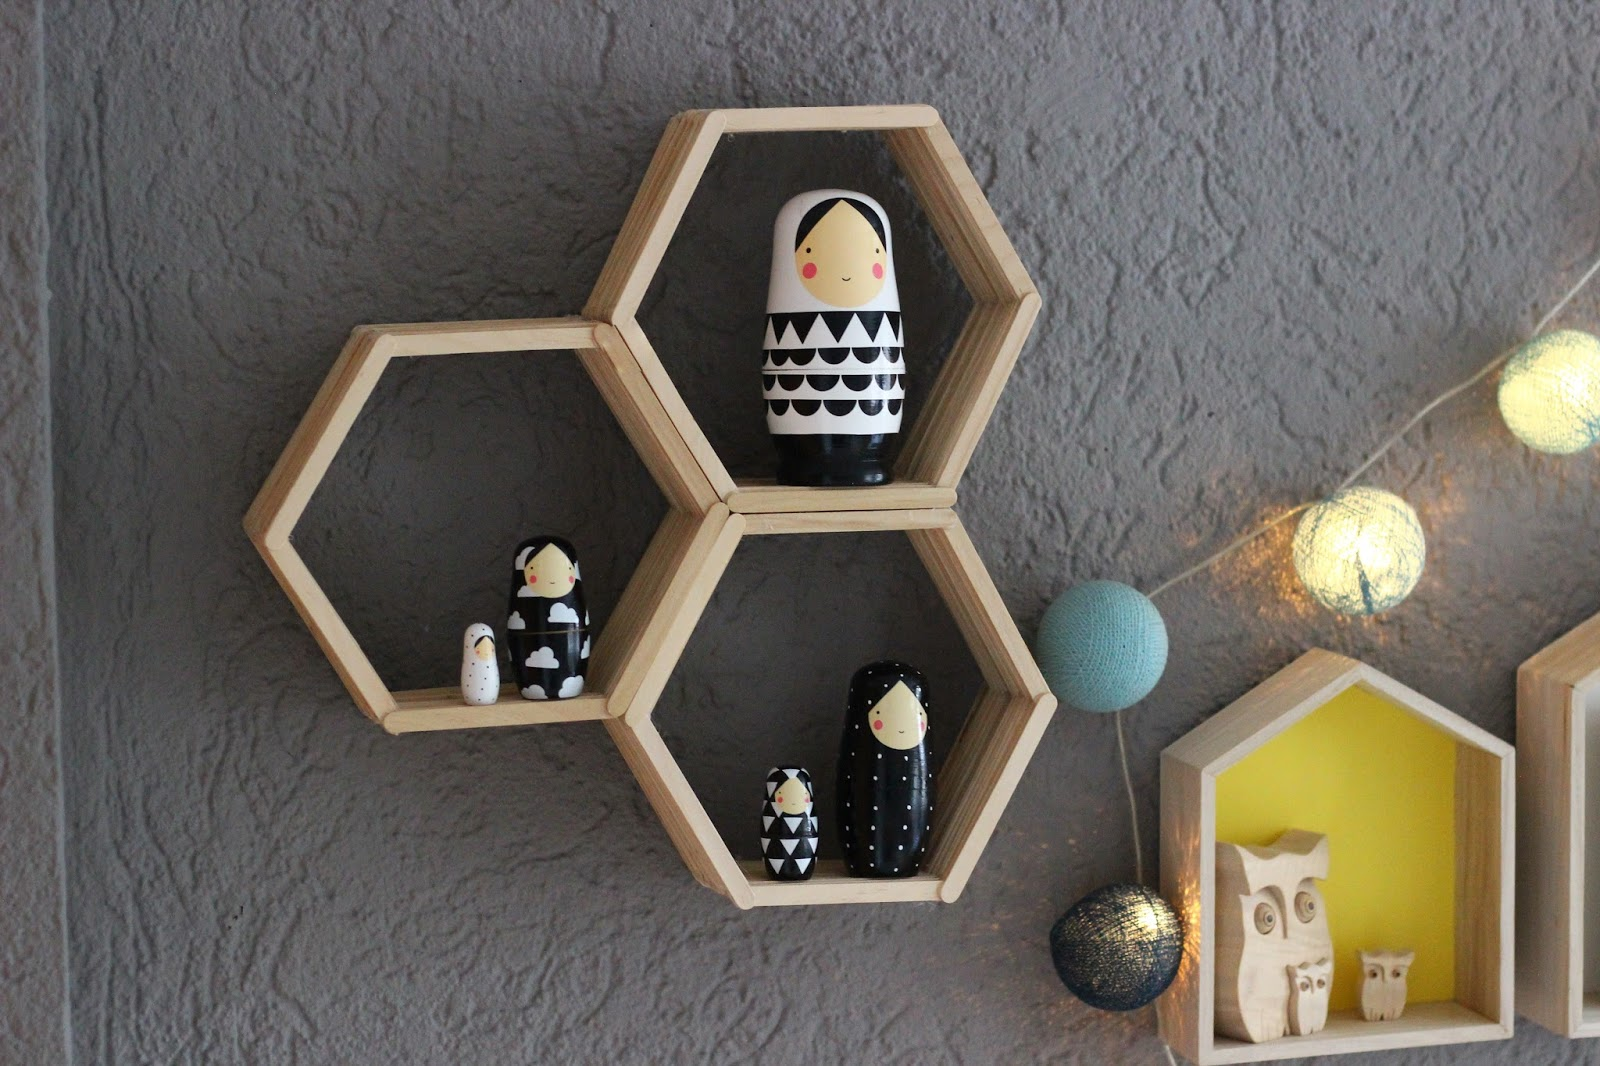 buecherregal design ideen, diy-idee: design-waben-regal aus eisstäbchen | apfelbäckchen, Design ideen